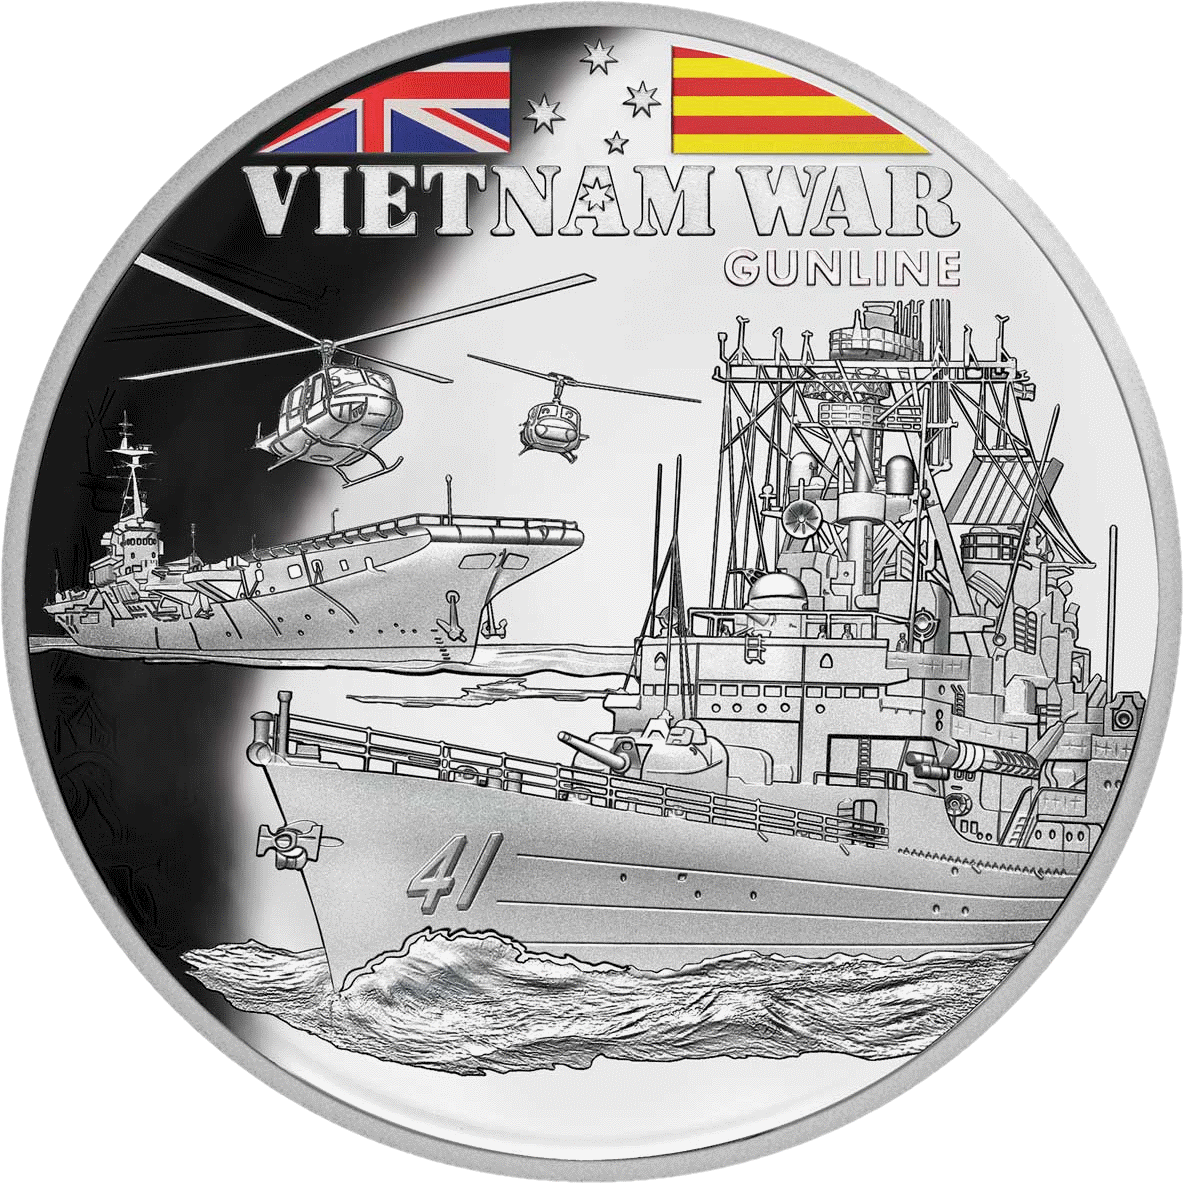 Ниуэ монета 1 доллар Ганлайн, реверс